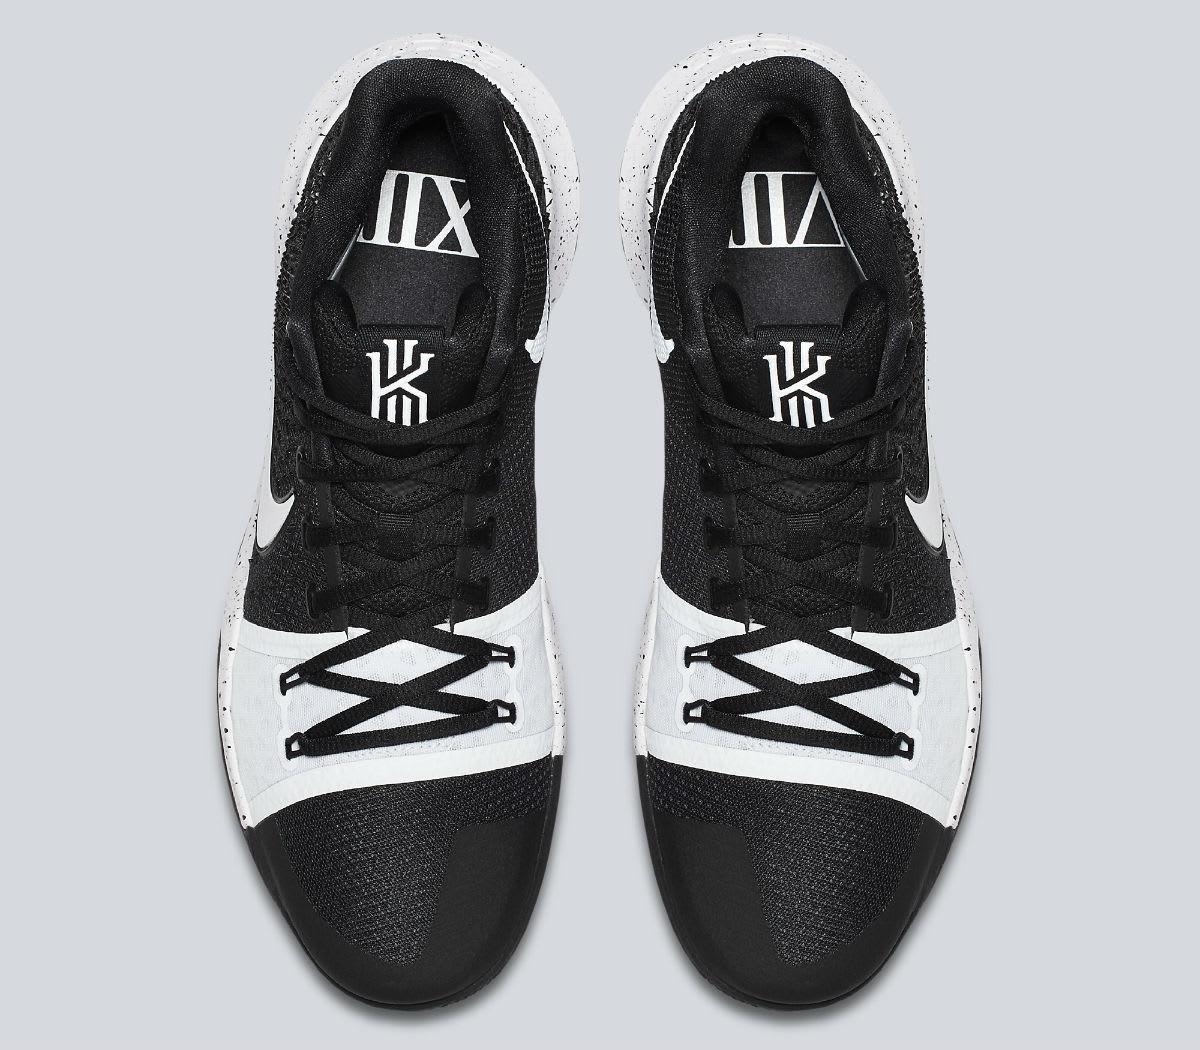 b5b0c5bd5c03 95aab f5501  discount code for nike kyrie 3 black white tuxedo release date  top 917724 001 daa70 440c8